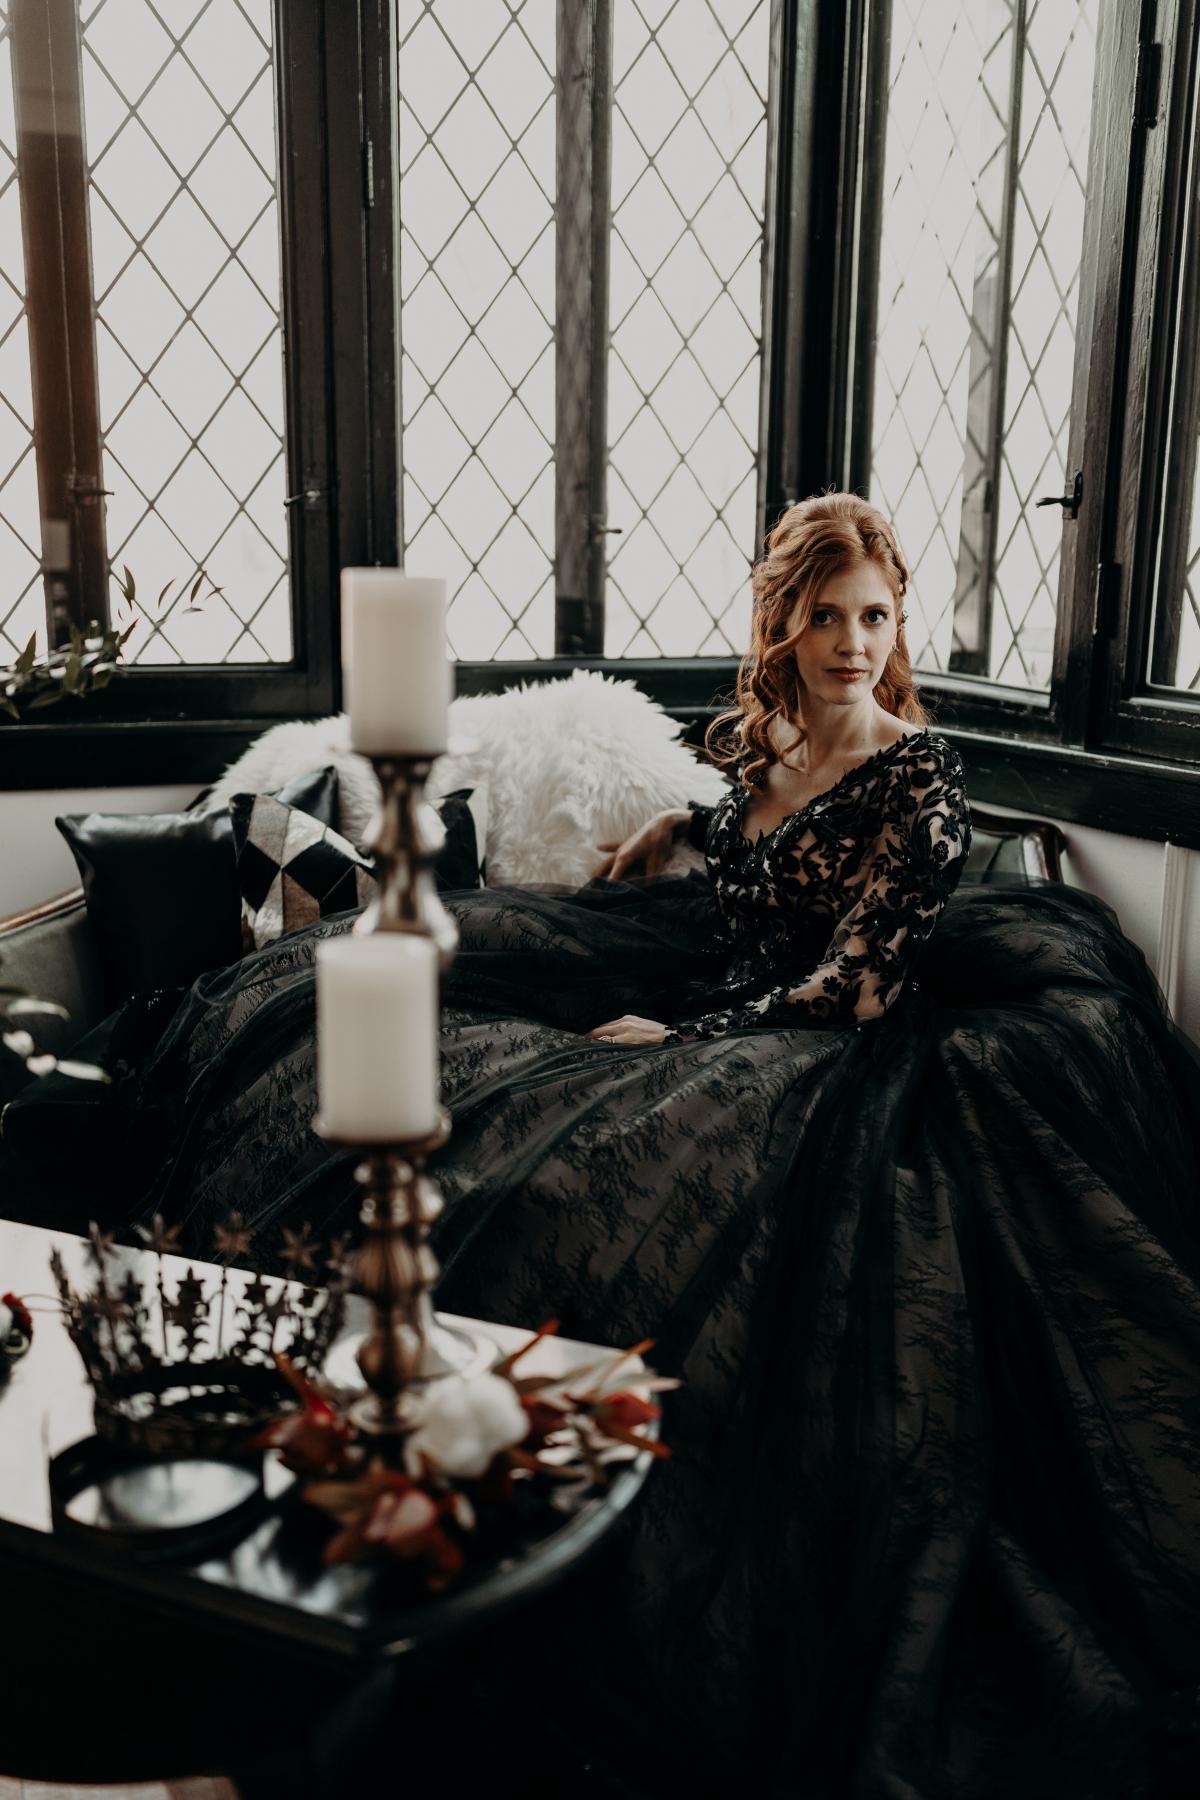 Game of Thrones Wedding Inspiration